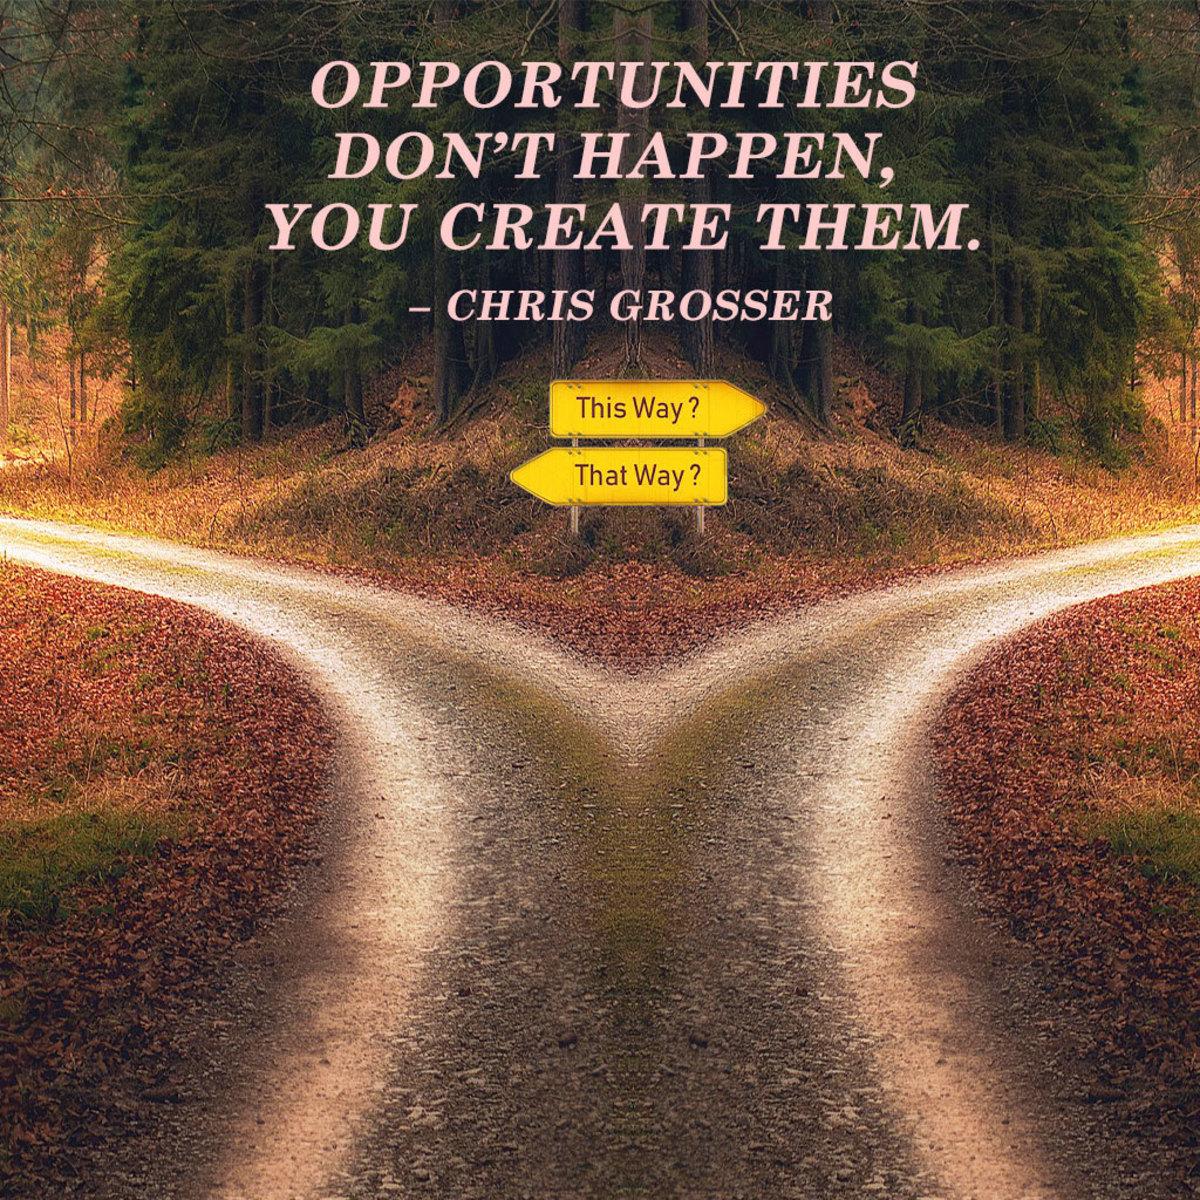 """Opportunities don't happen, you create them."" ― Chris Grosser"